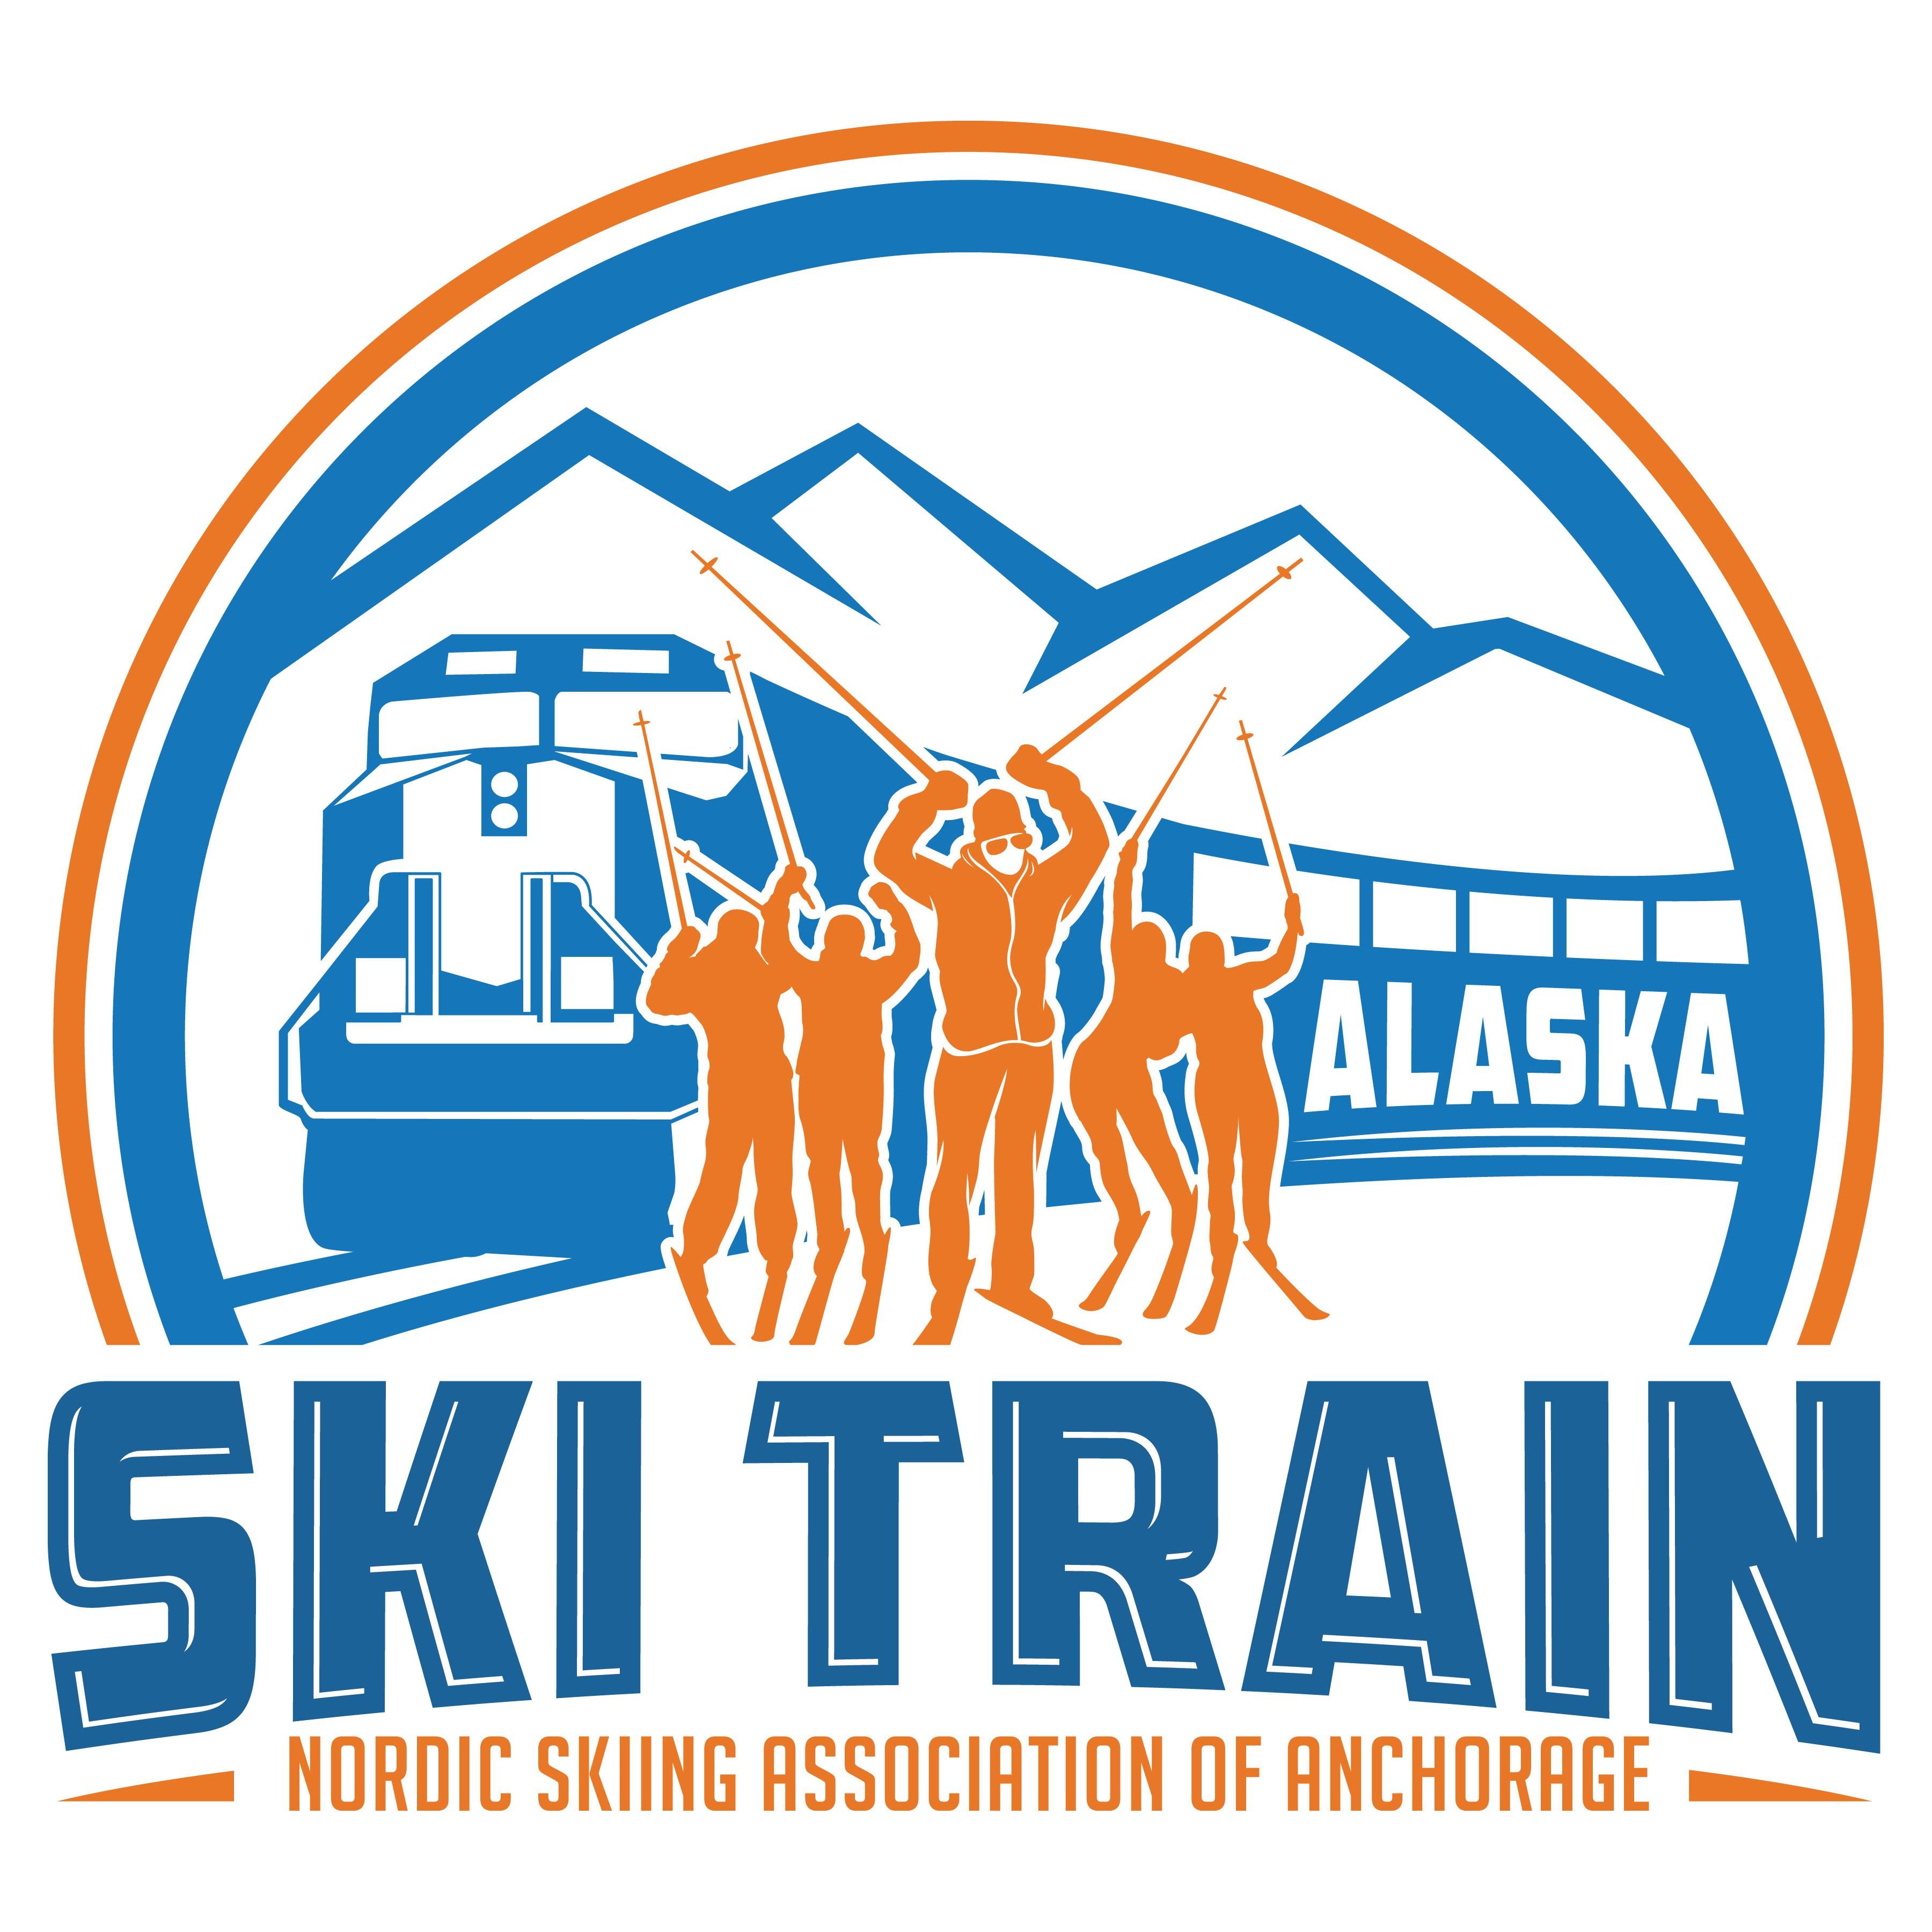 Ski Train needs a creative logo